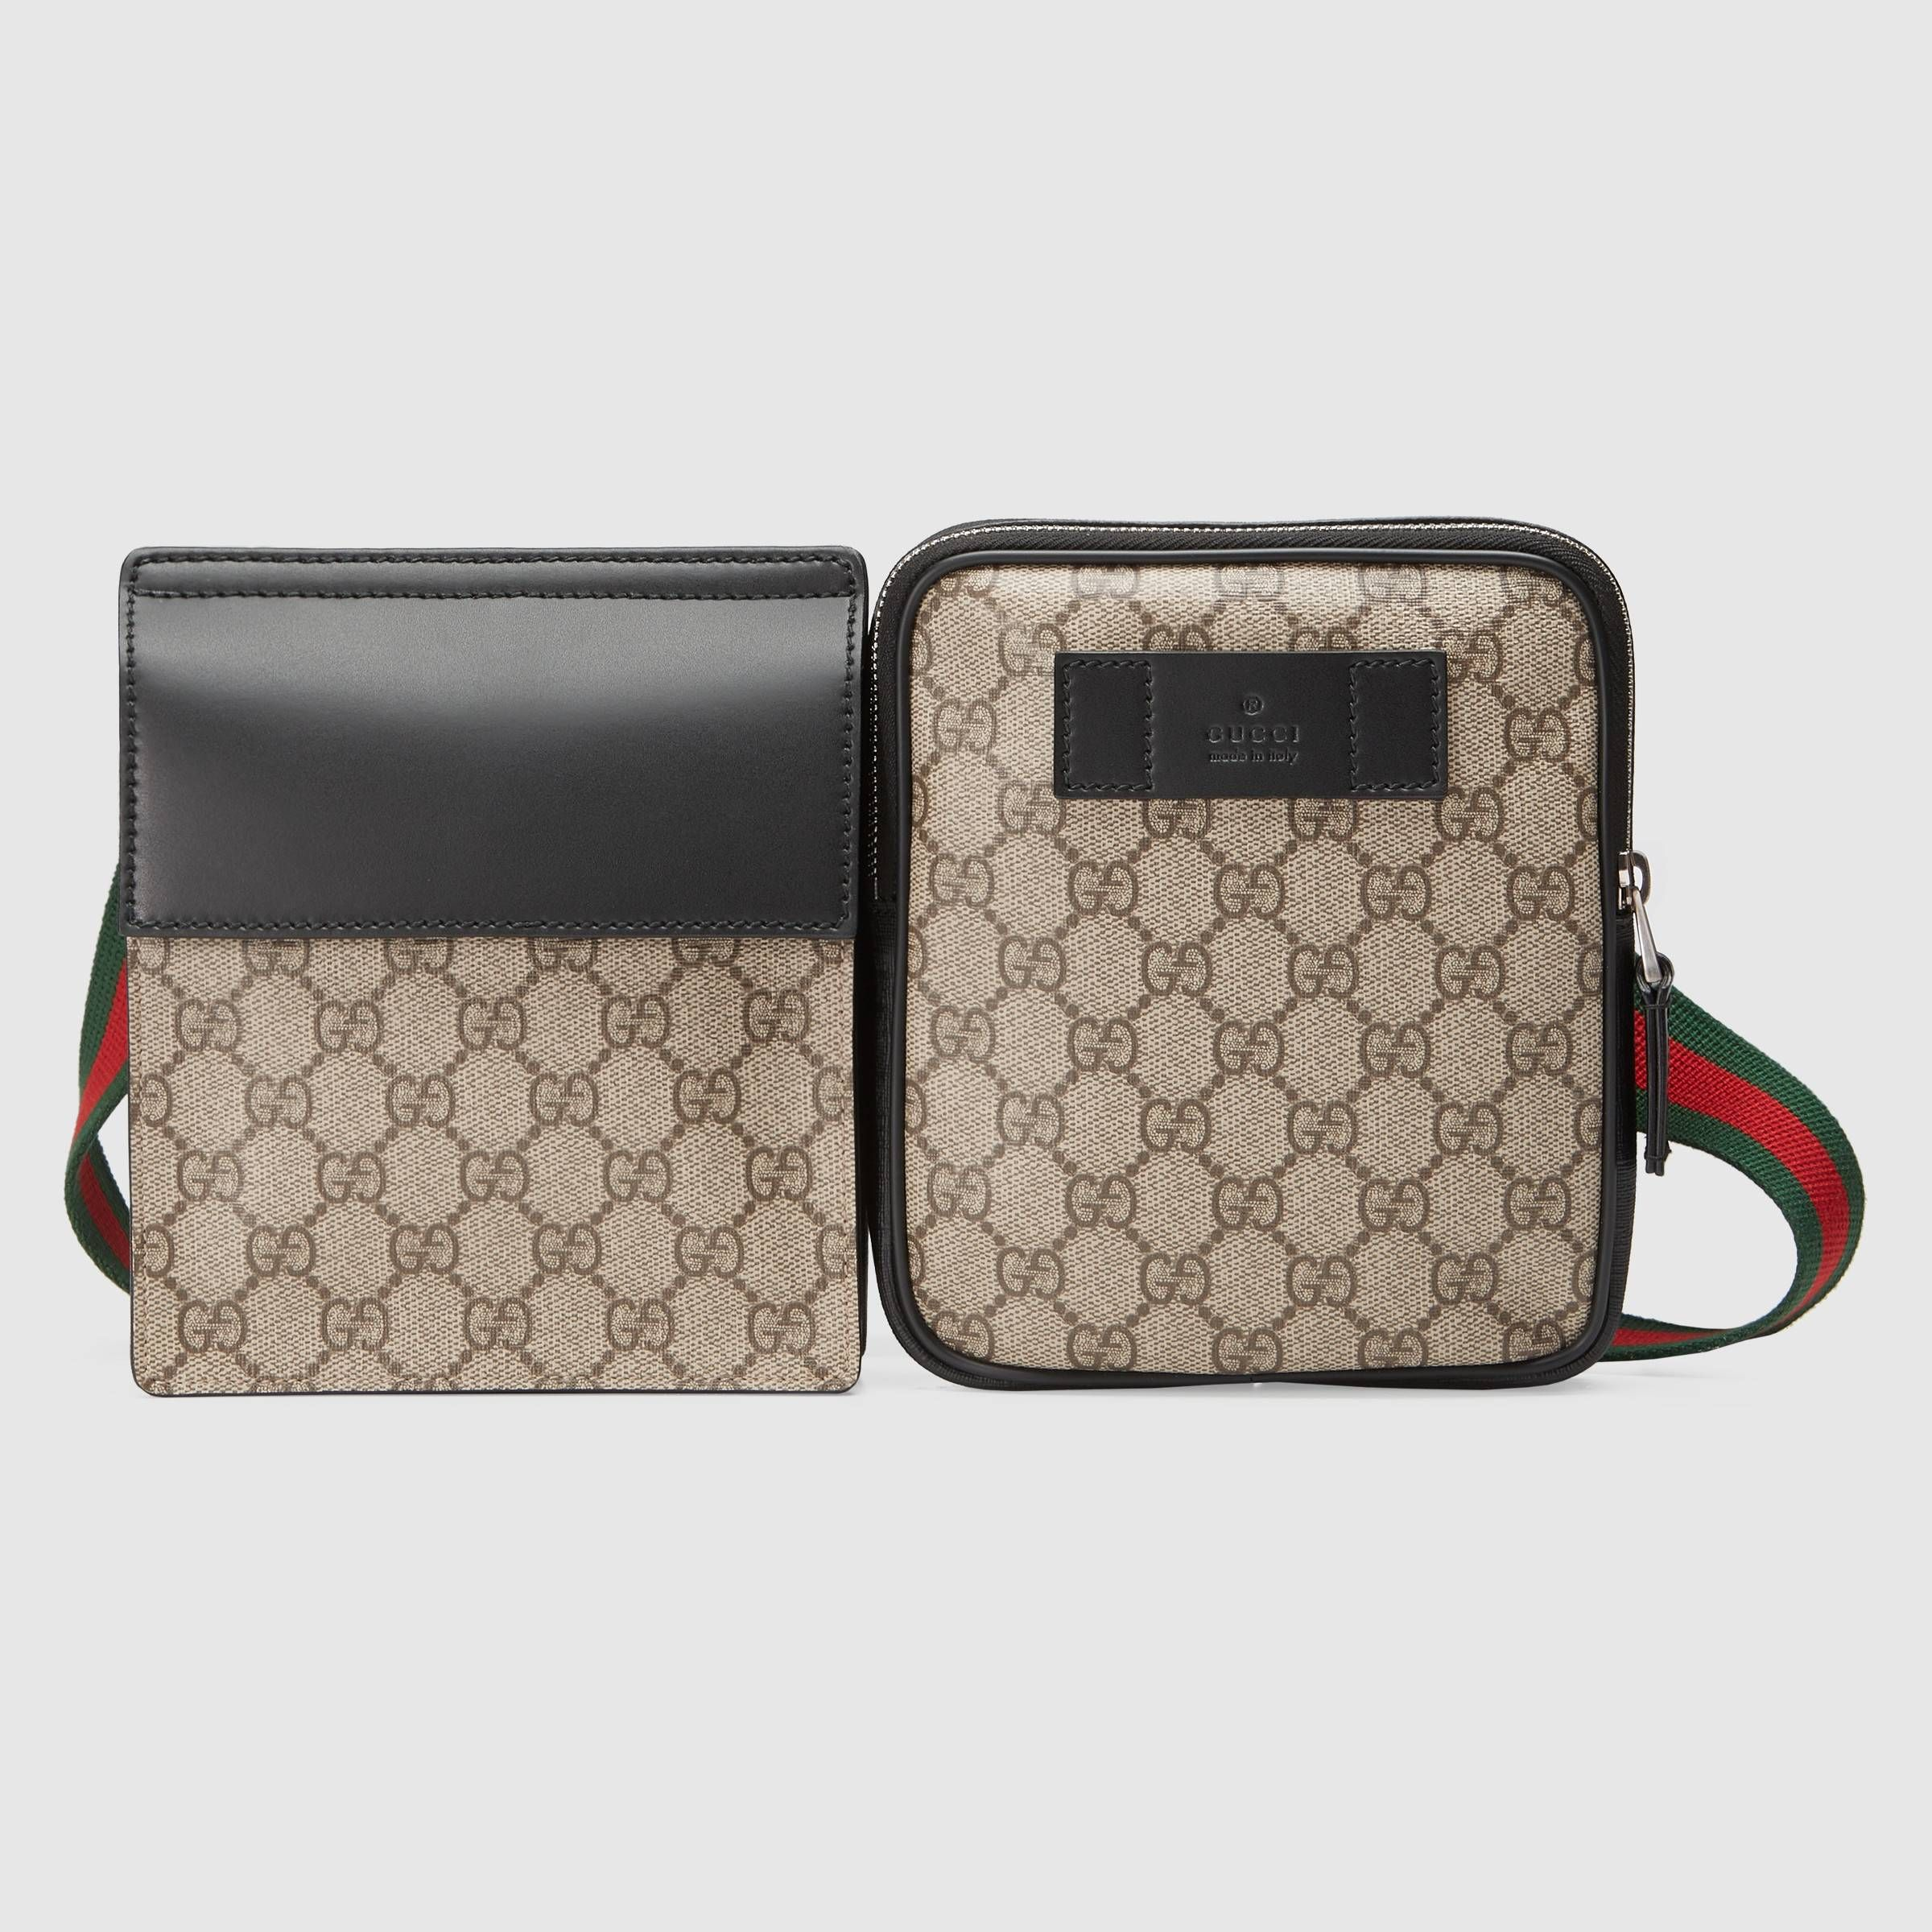 4821f9cac GG Supreme belt bag - Gucci Women's Luggage & Lifestyle Bags 450956K6RHX9678